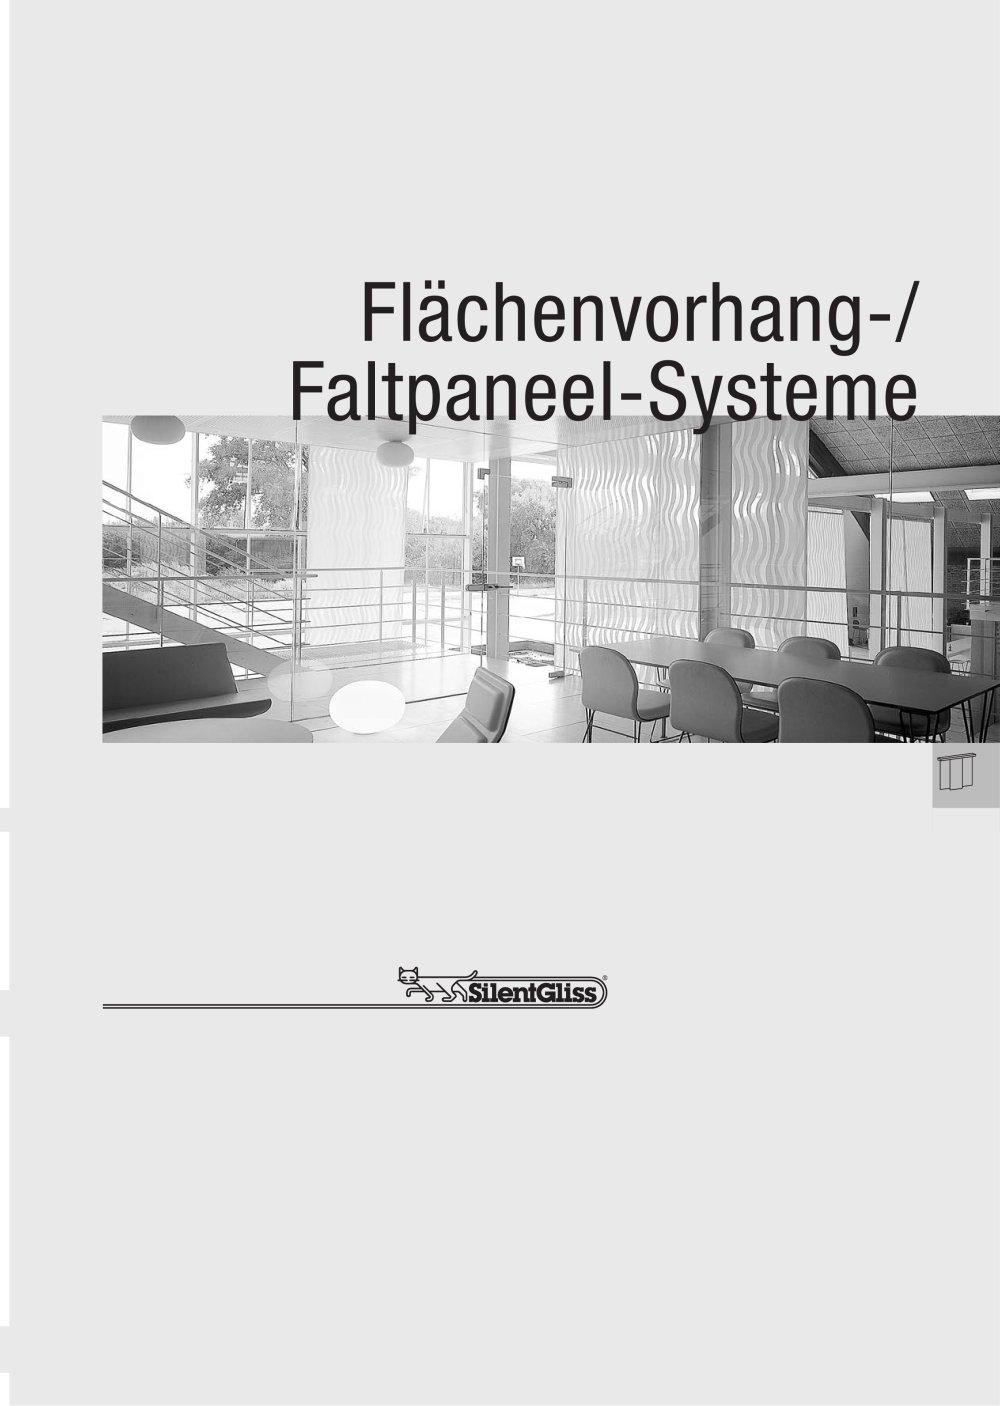 flächenvorhang-/ faltpaneel-systeme - silent gliss international